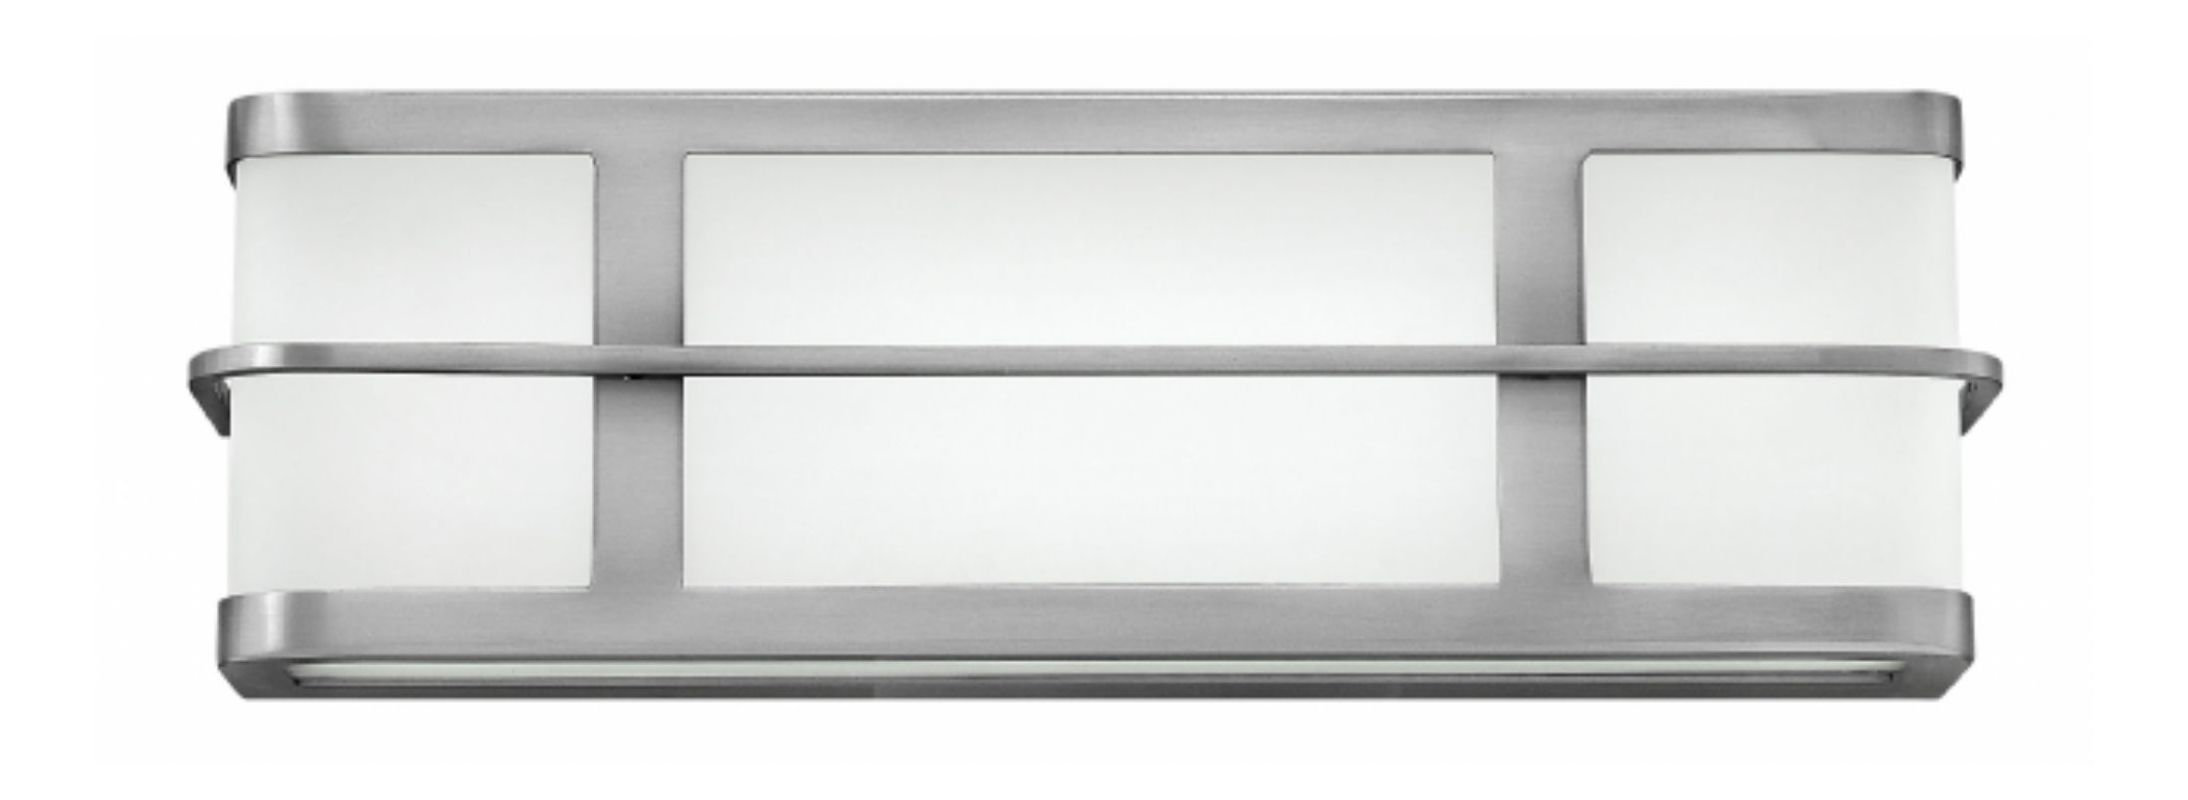 Hinkley Lighting 54812 1 Light ADA Compliant LED Bathroom Bath Bar